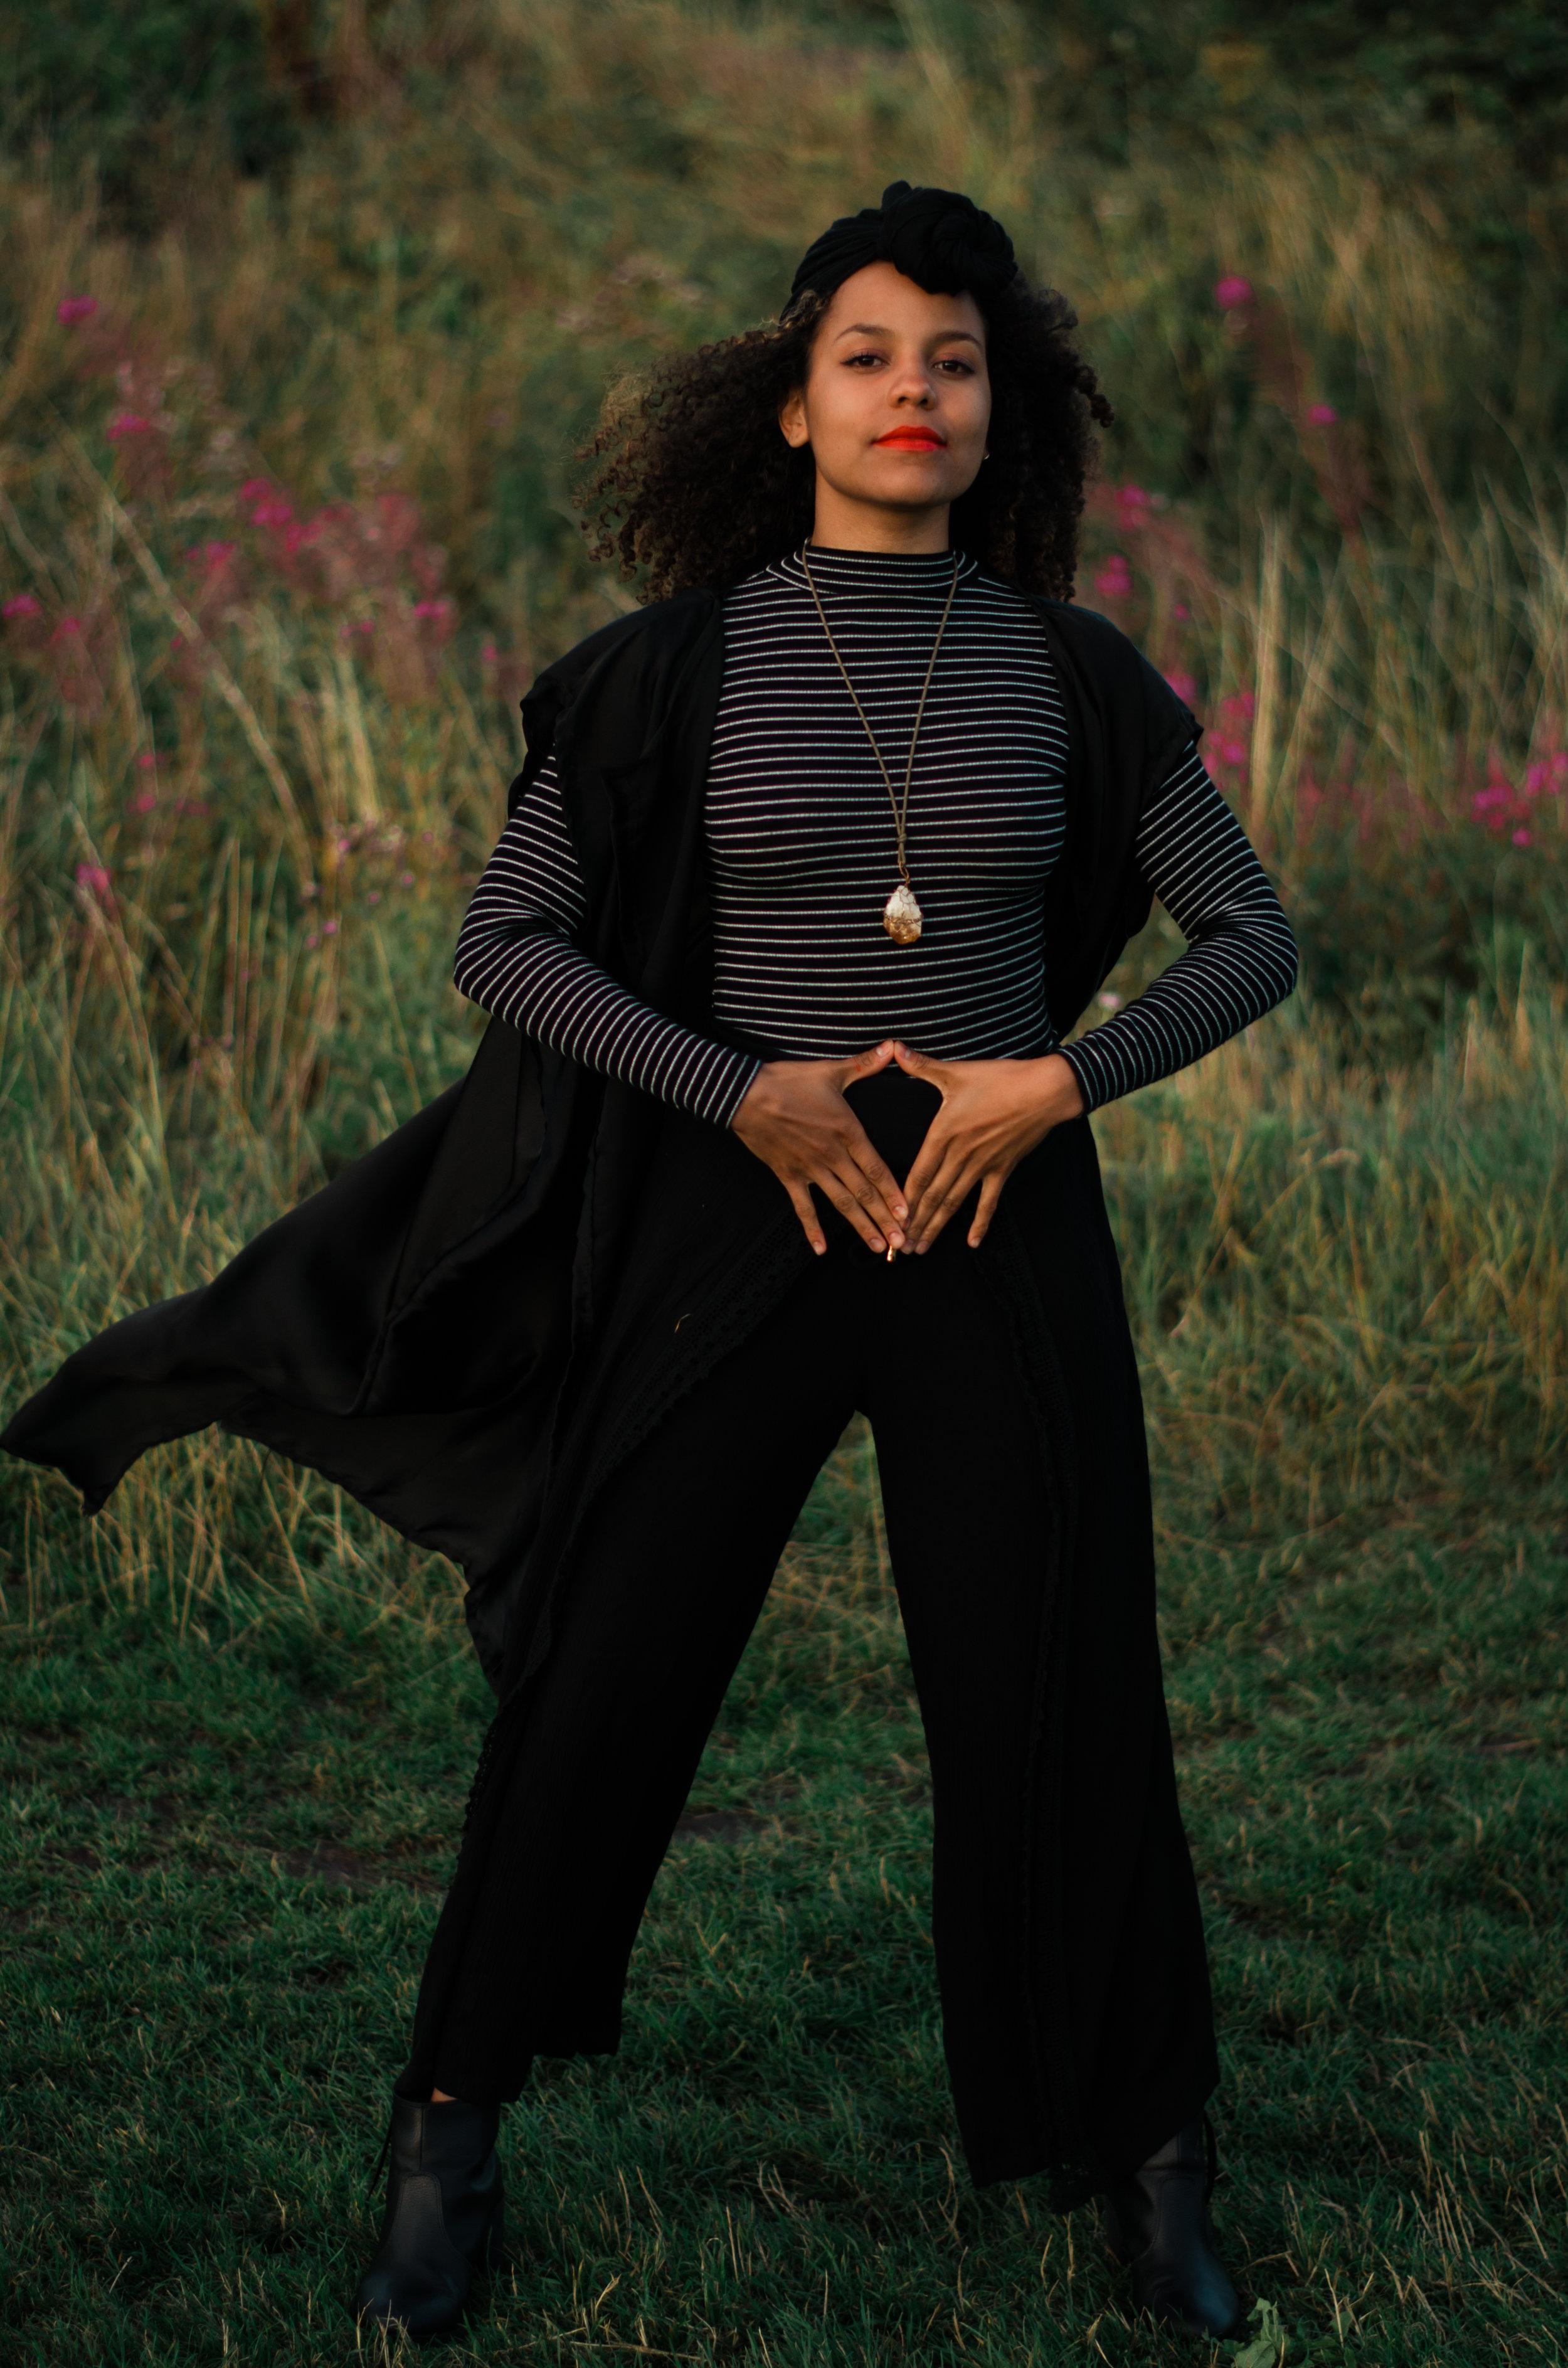 Inka-Portrait-Session-Aiste-Saulyte-Photography-17-07-30-533.jpg